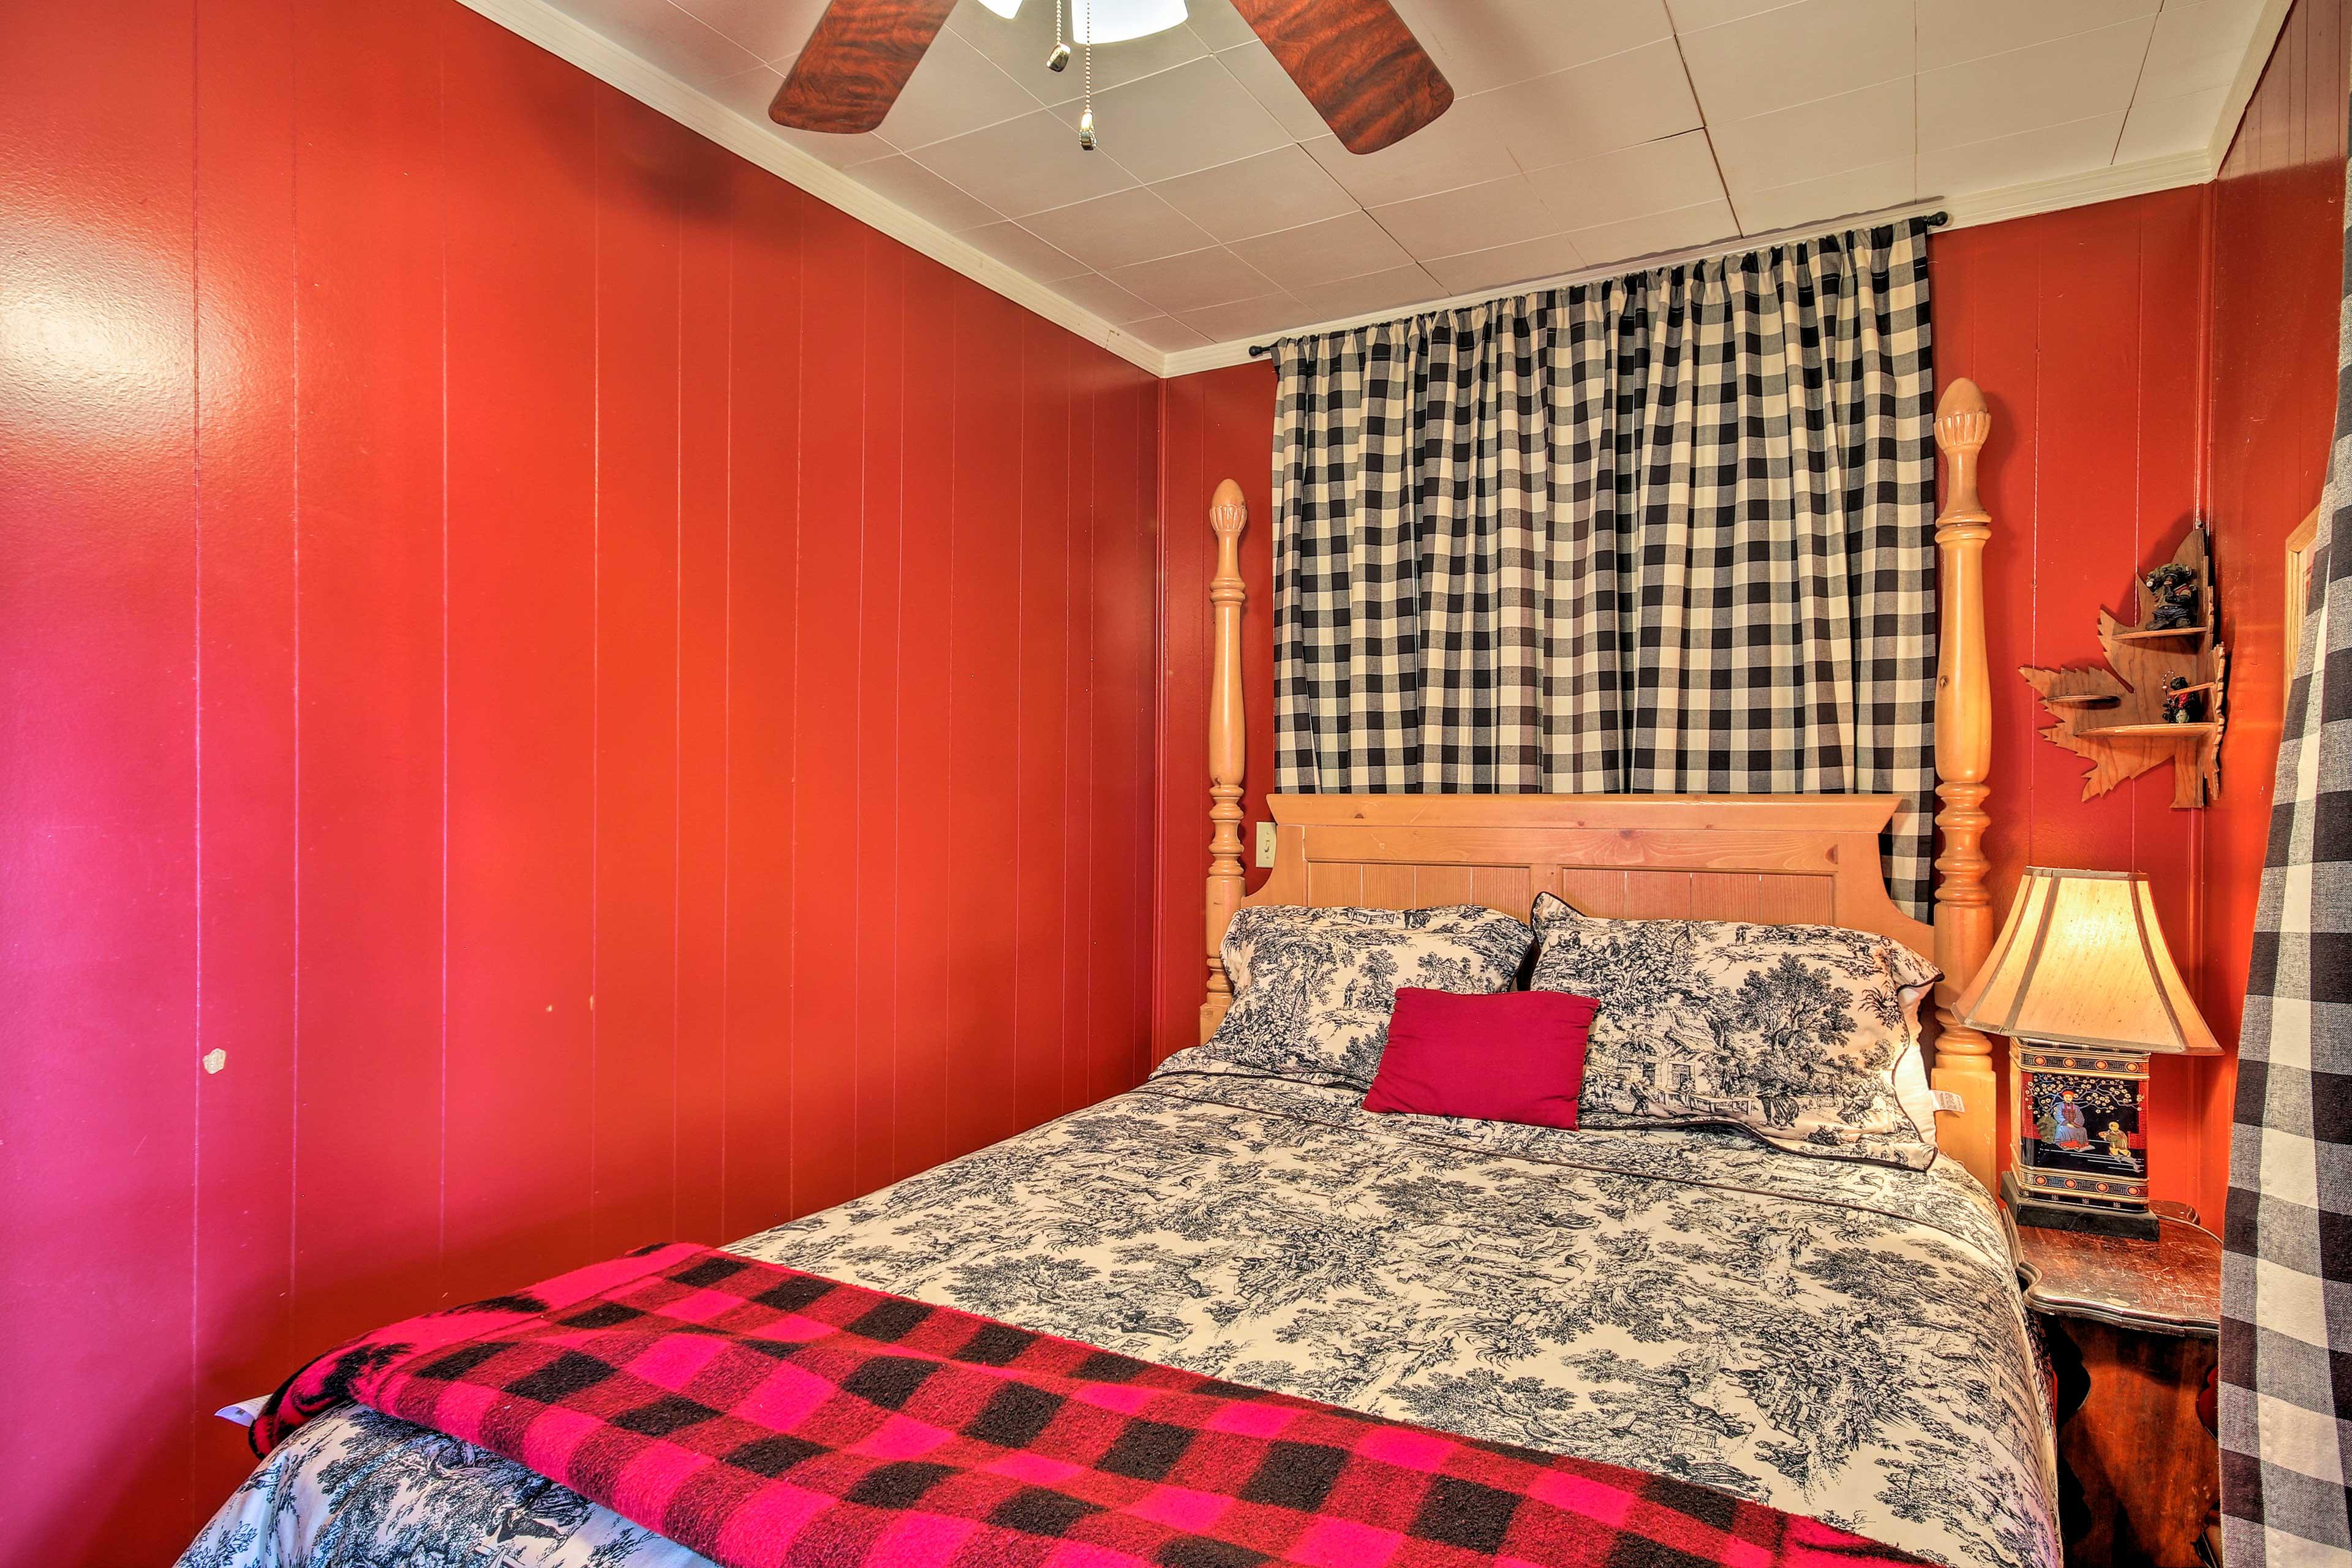 Have sweet dreams in this cozy bedroom.